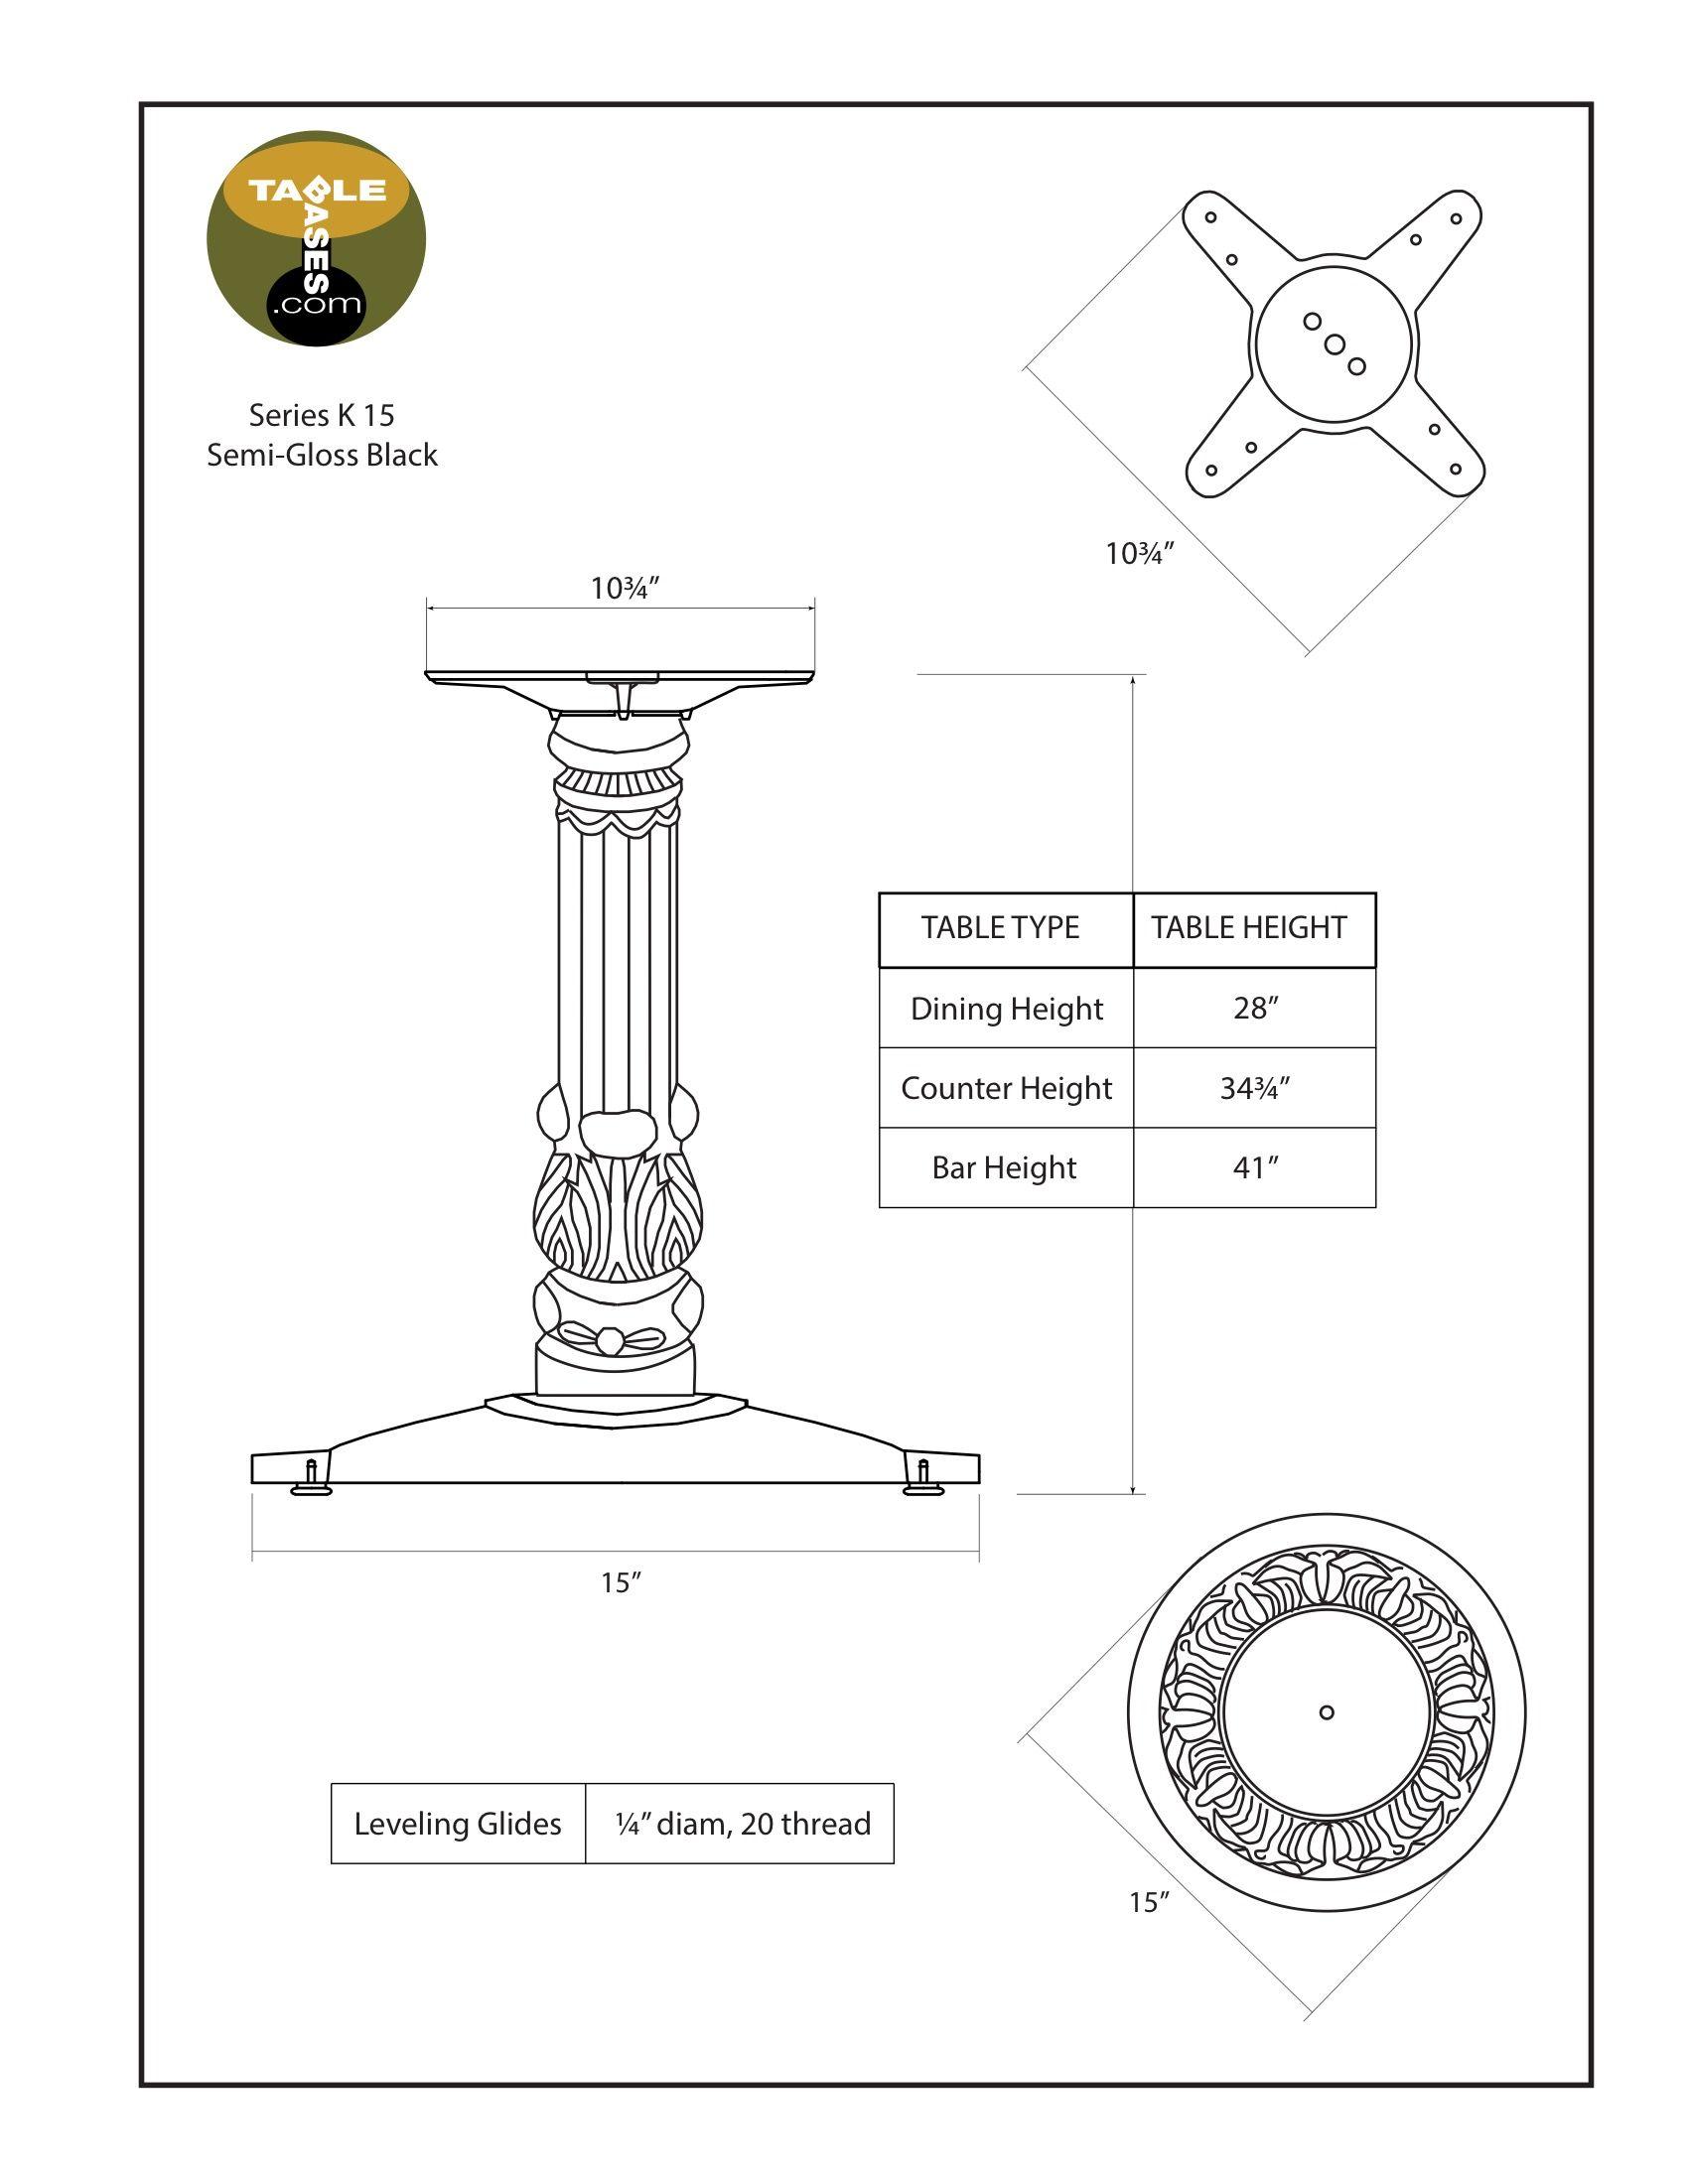 K15 Semi-Gloss Black Table Base - Specifications